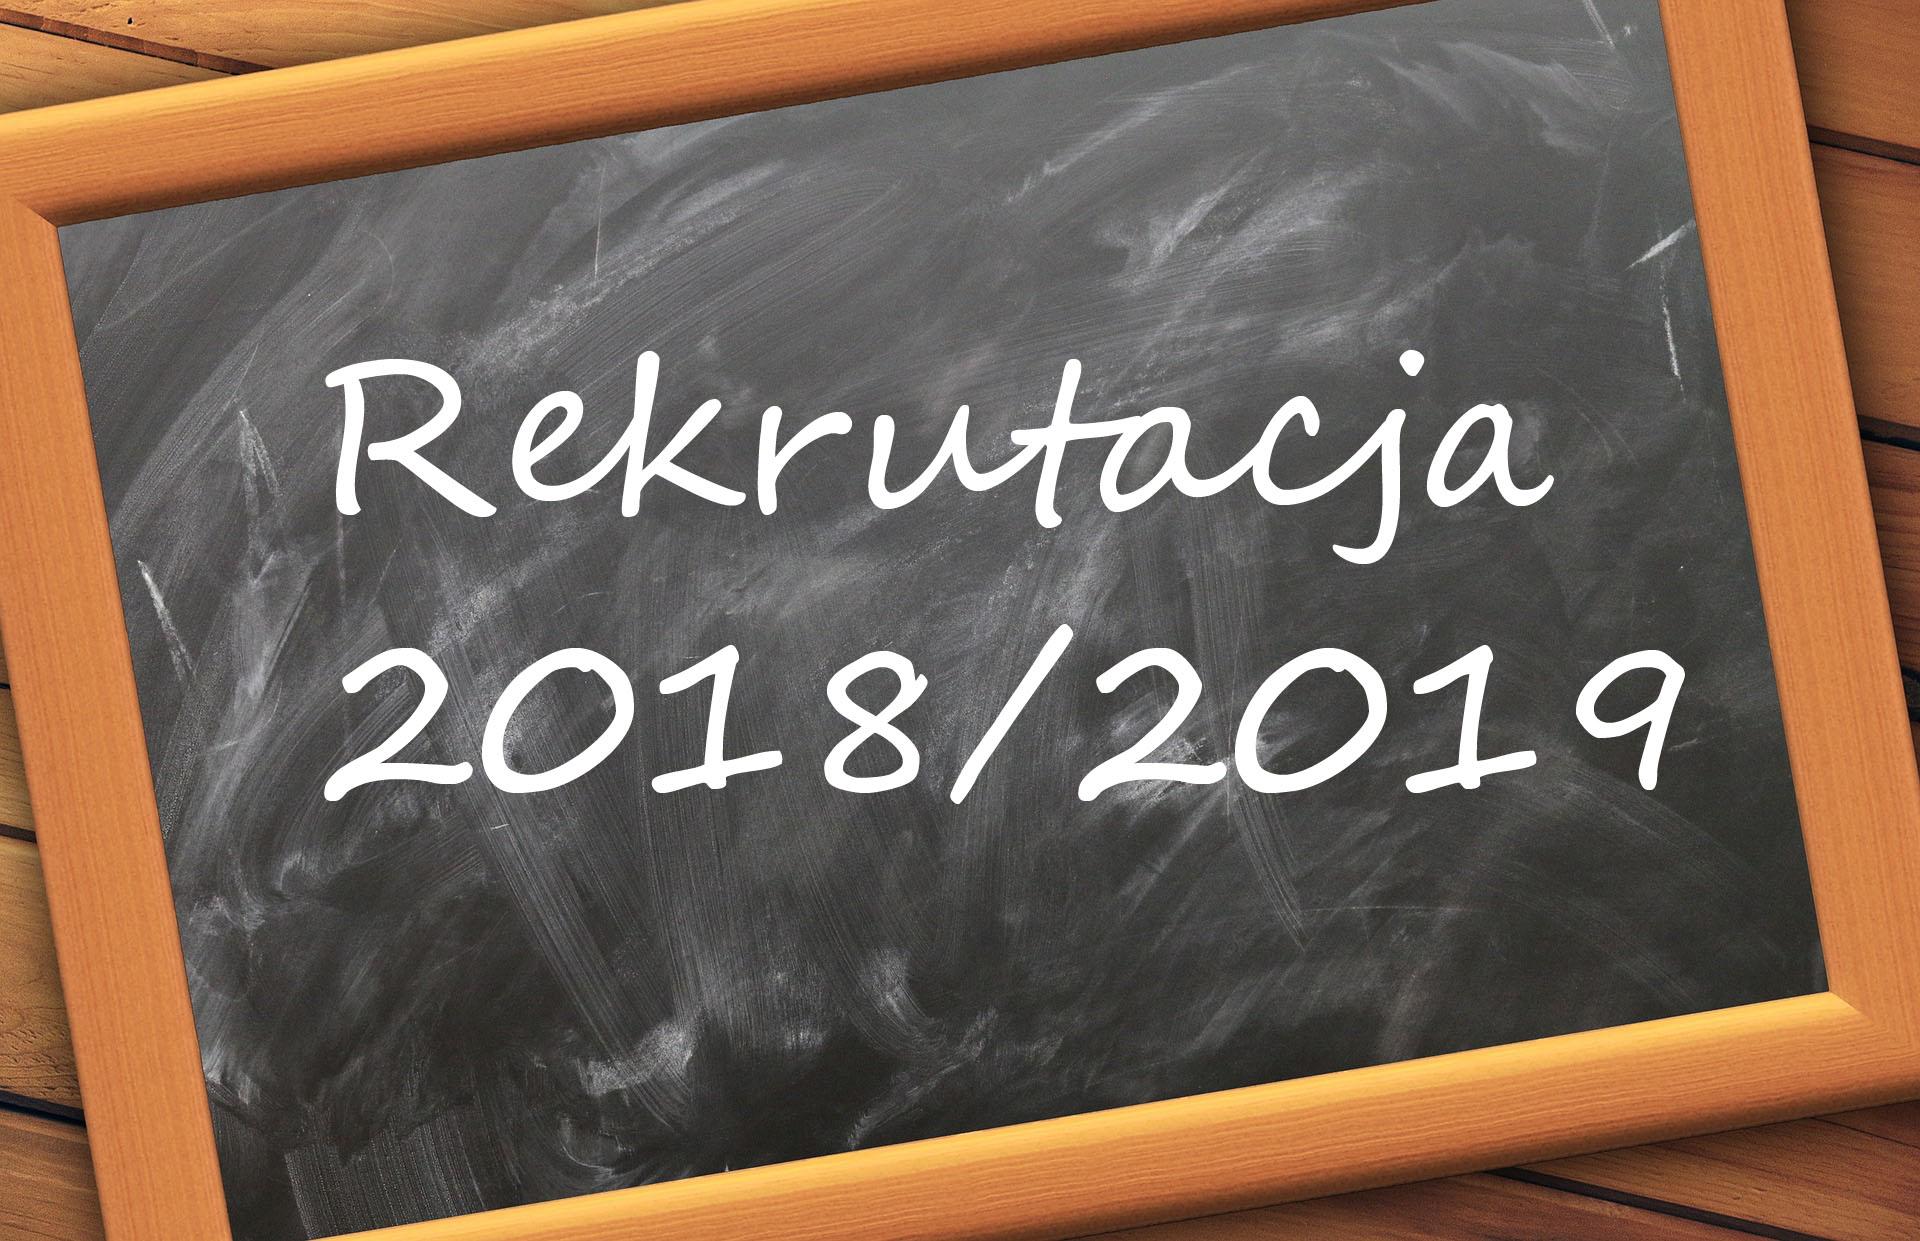 rekrutacja 2018 19